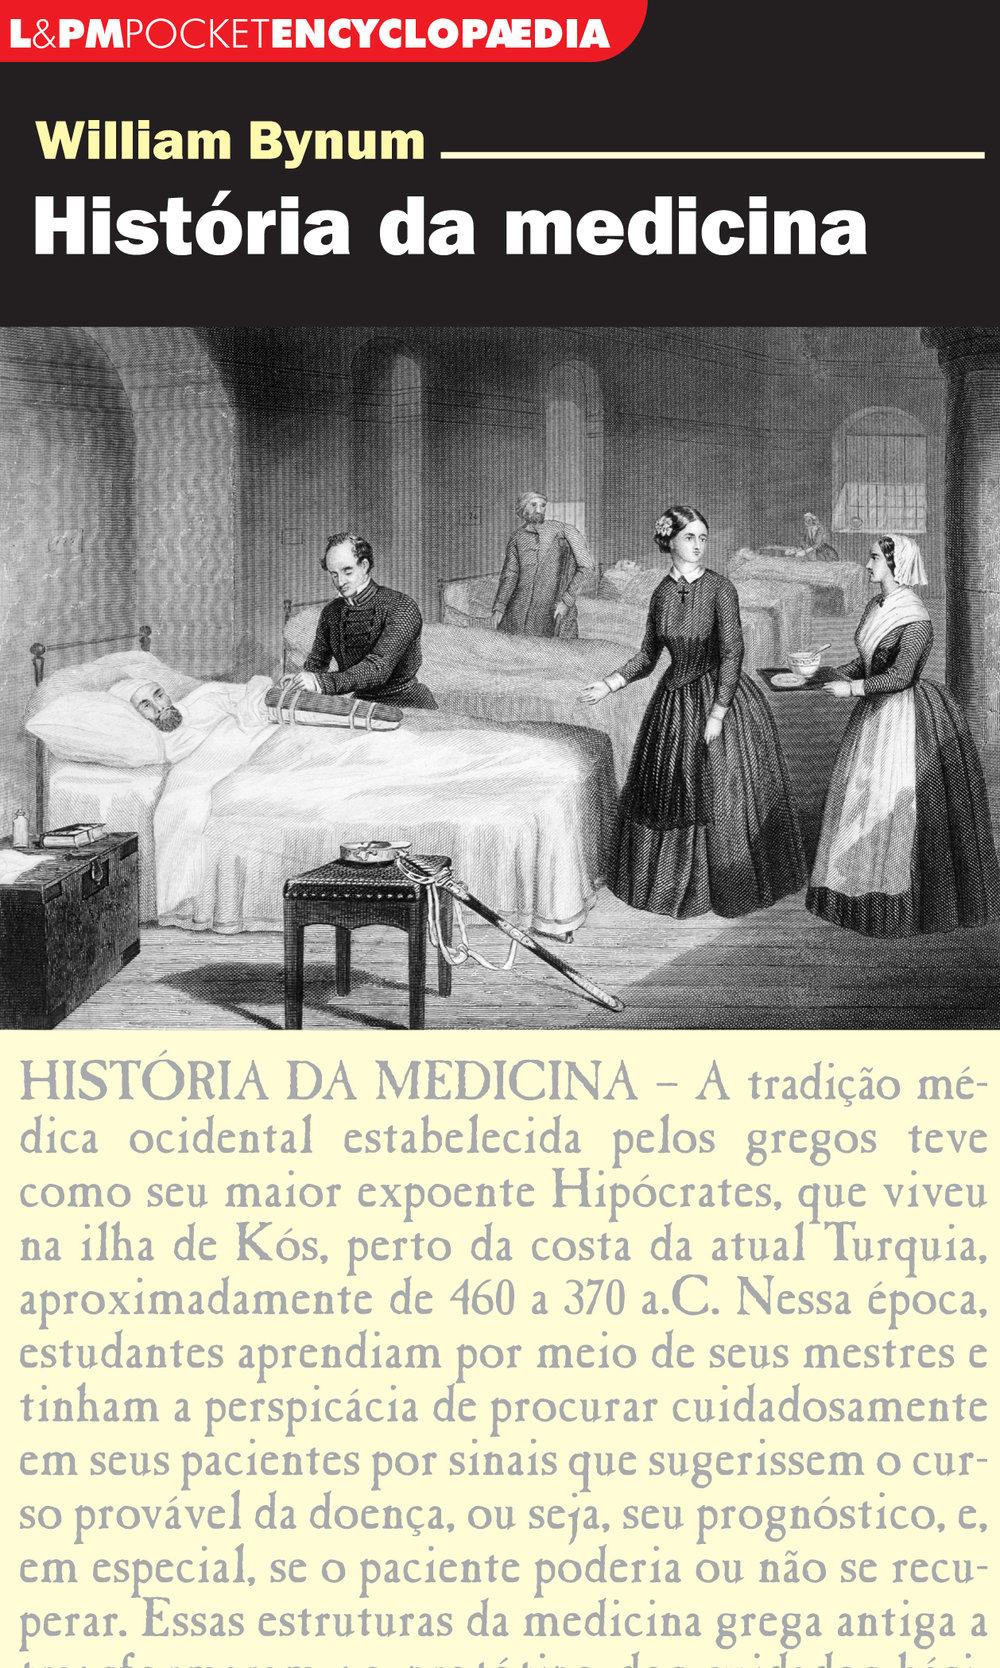 historia_da_medicina.jpg